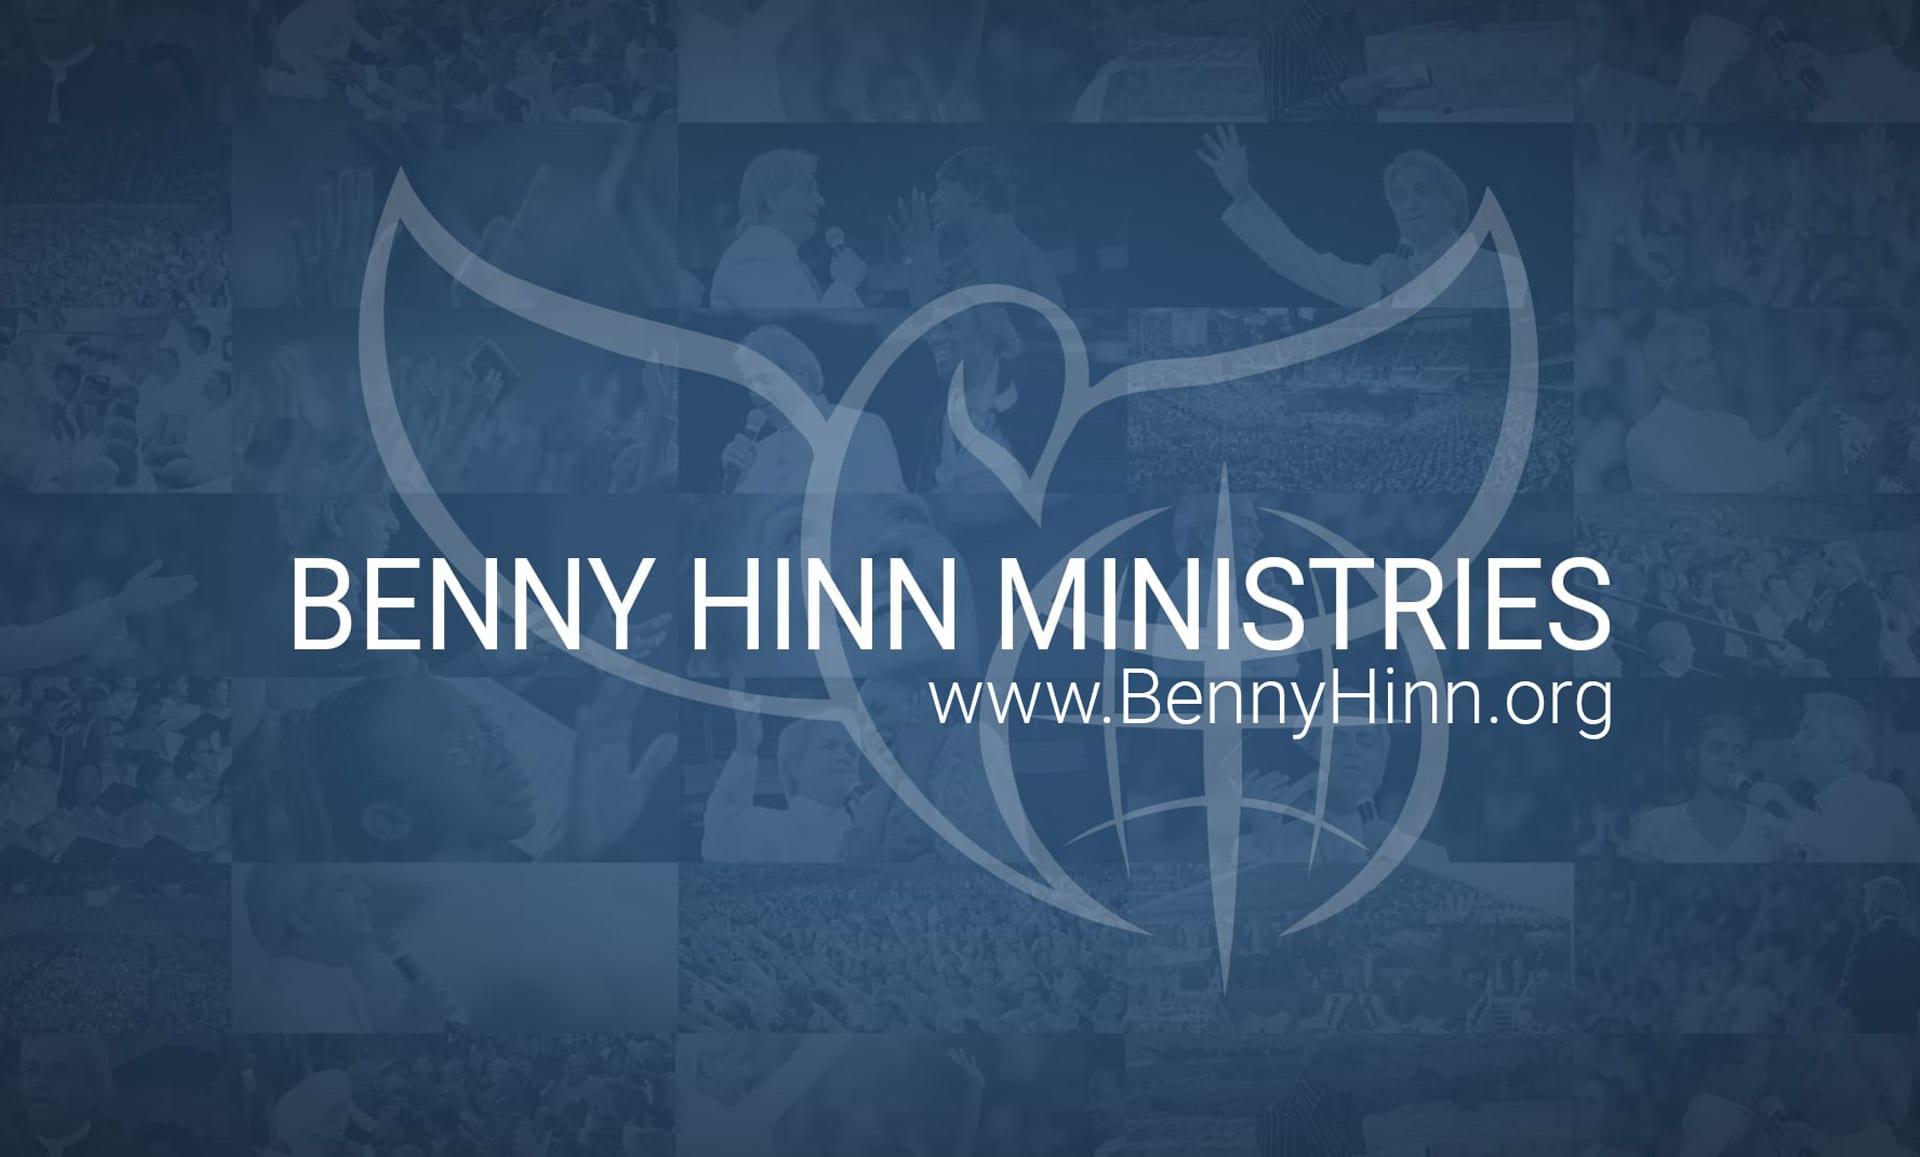 Benny Hinn Discusses the Prosperity Gospel - Benny Hinn